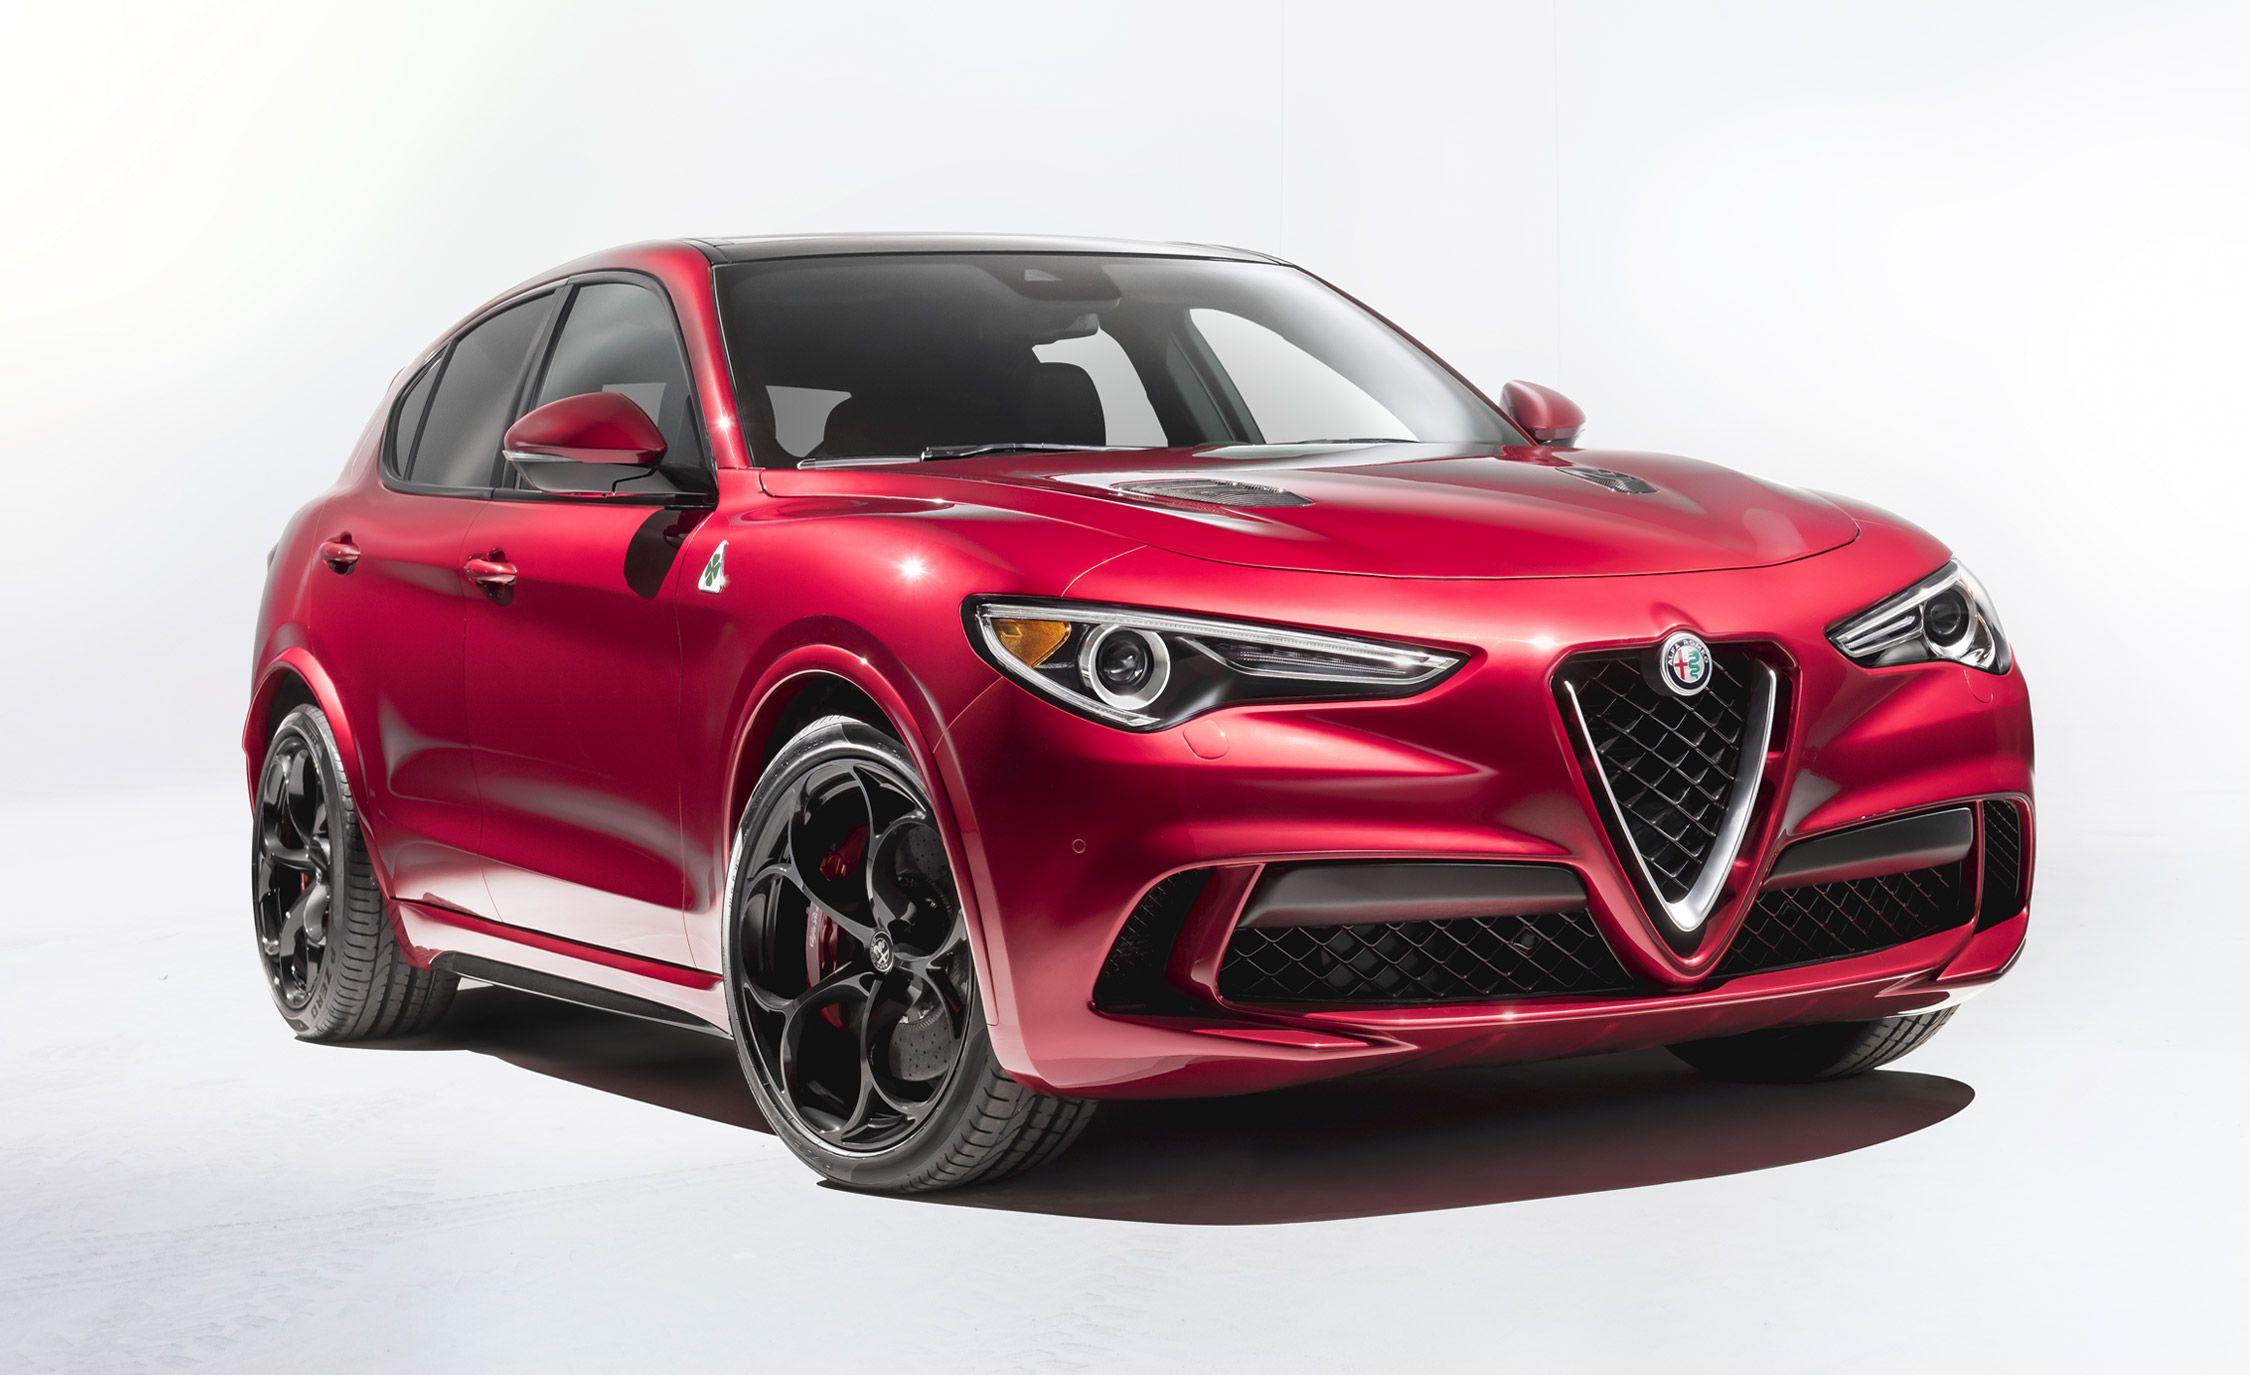 2018 Alfa Romeo Stelvio: We'll Take the 505-HP Version, Please